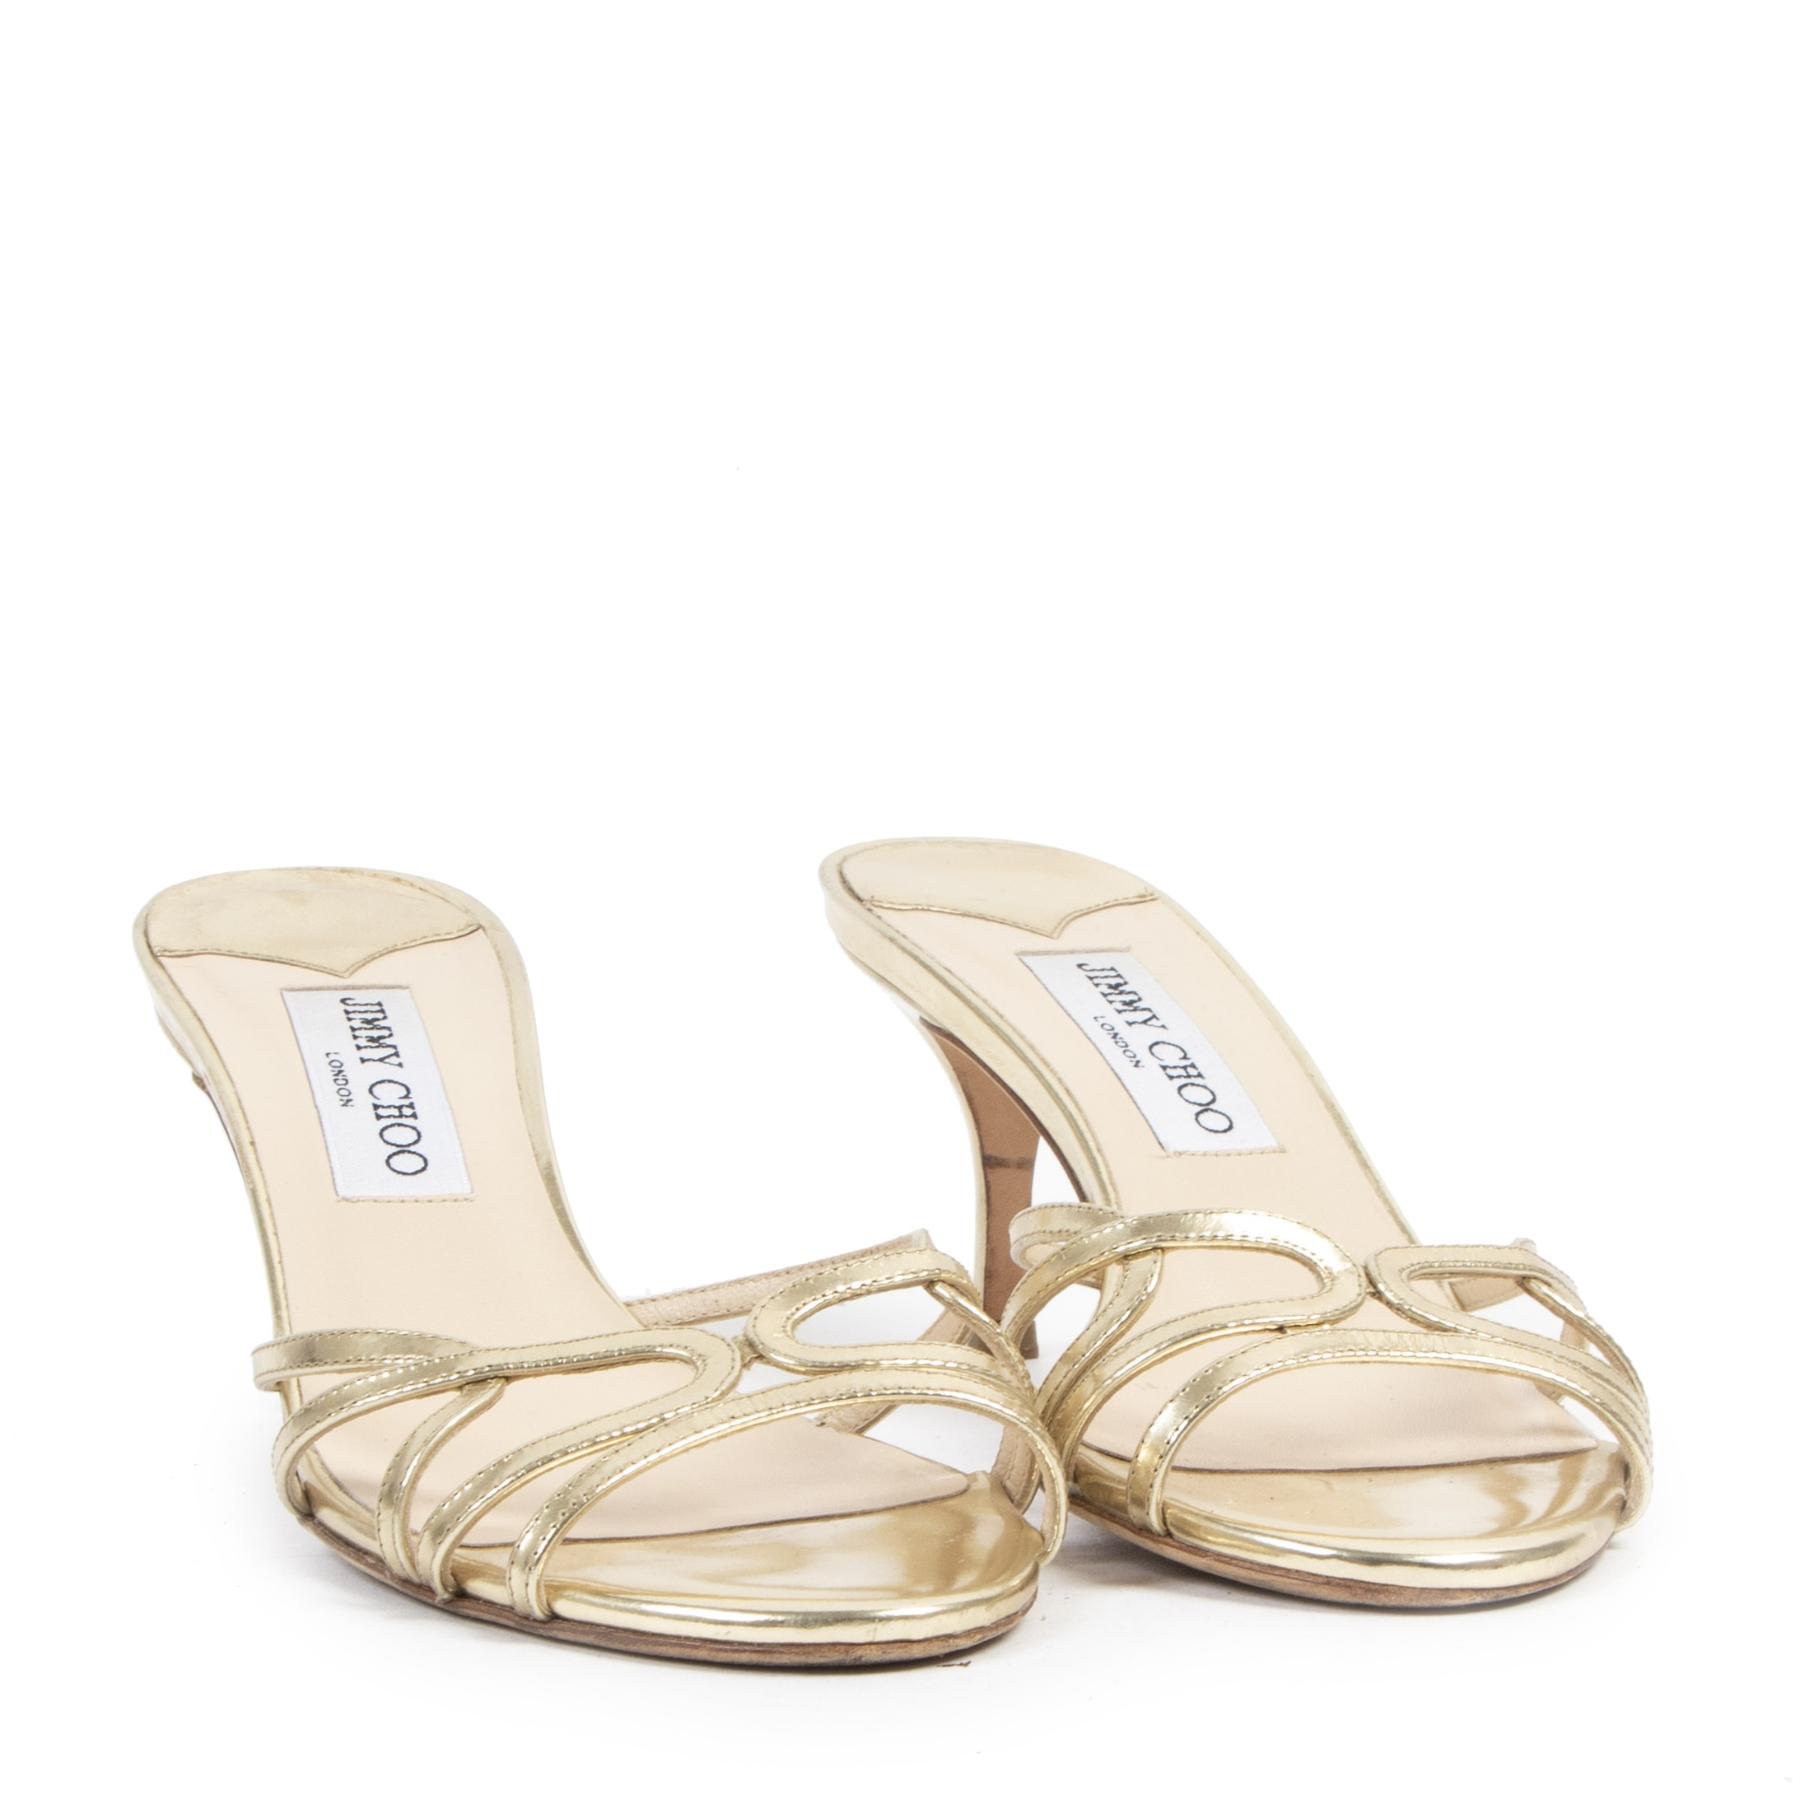 Authentic secondhand Jimmy Choo Gold Heeled Sandals - Size 37 designer shoes fashion luxury vintage webshop safe secure online shopping